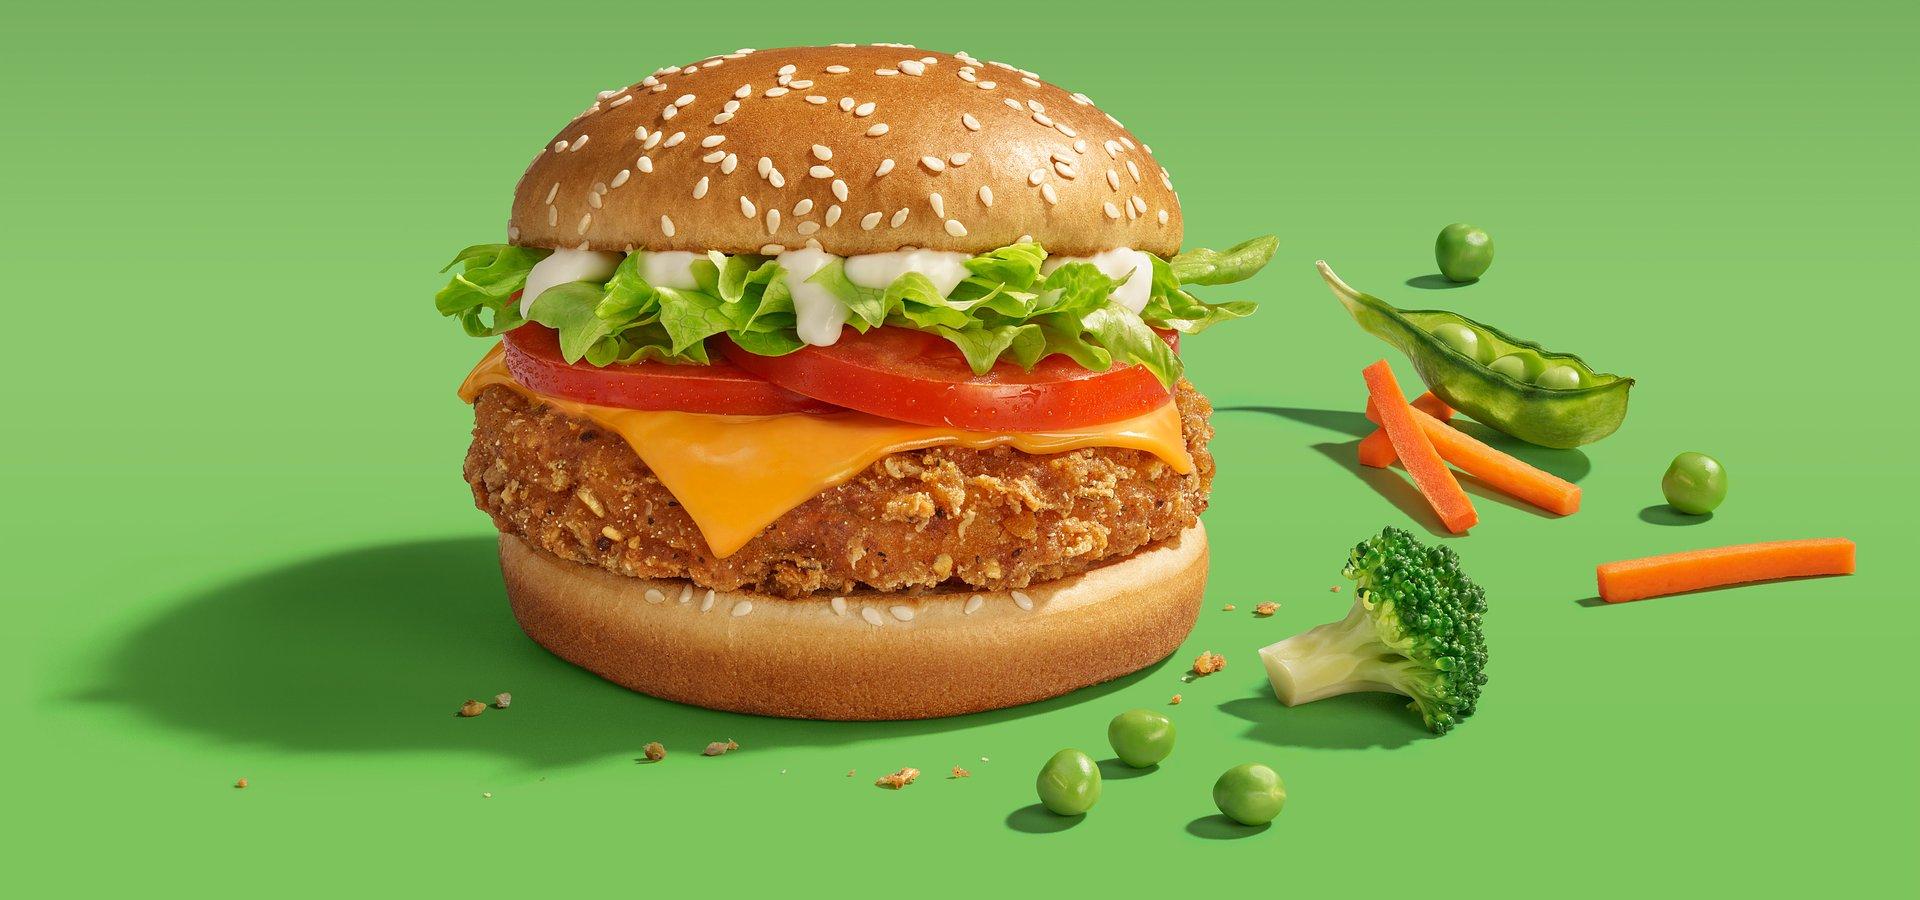 Veggie Burger Mcdonalds - Nowosciproduktowe.pl